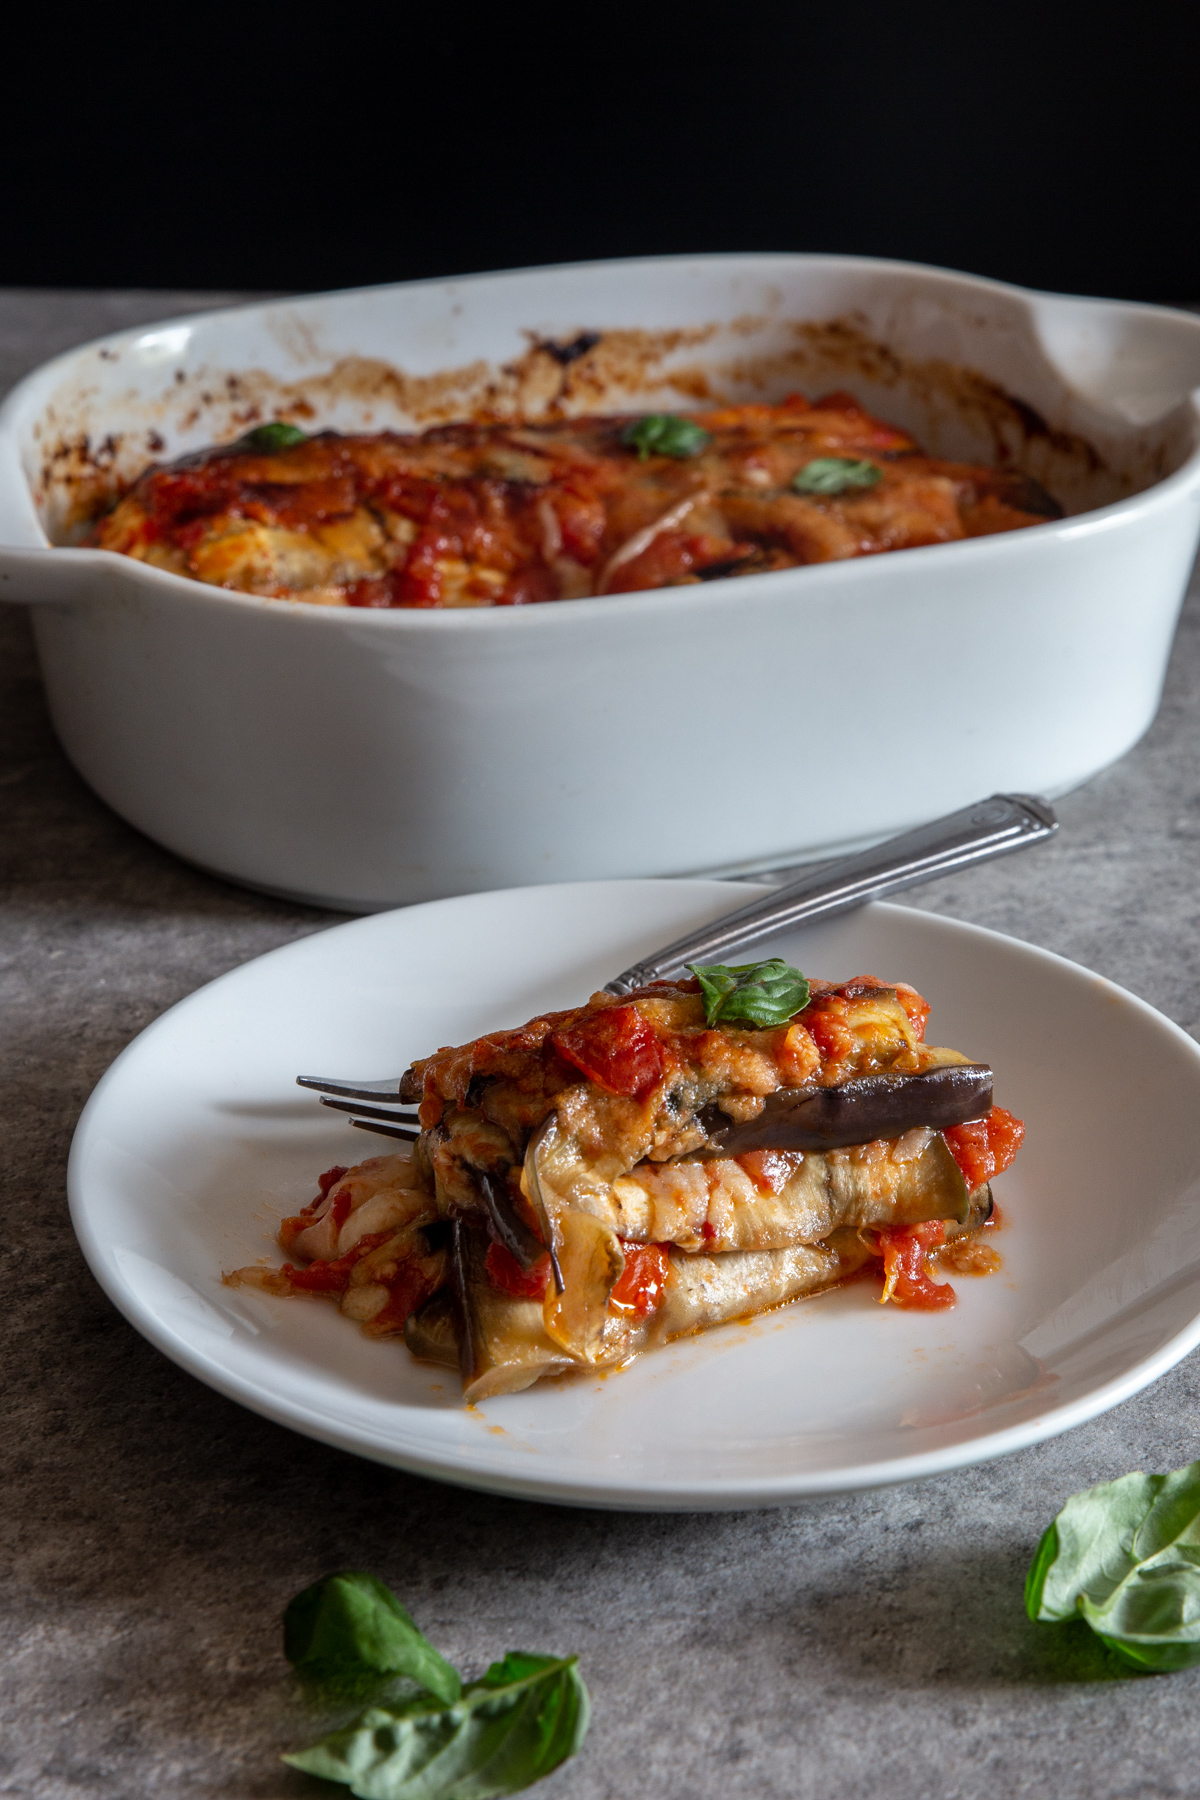 Pasticcio in a white dish with a slice on a white plate.